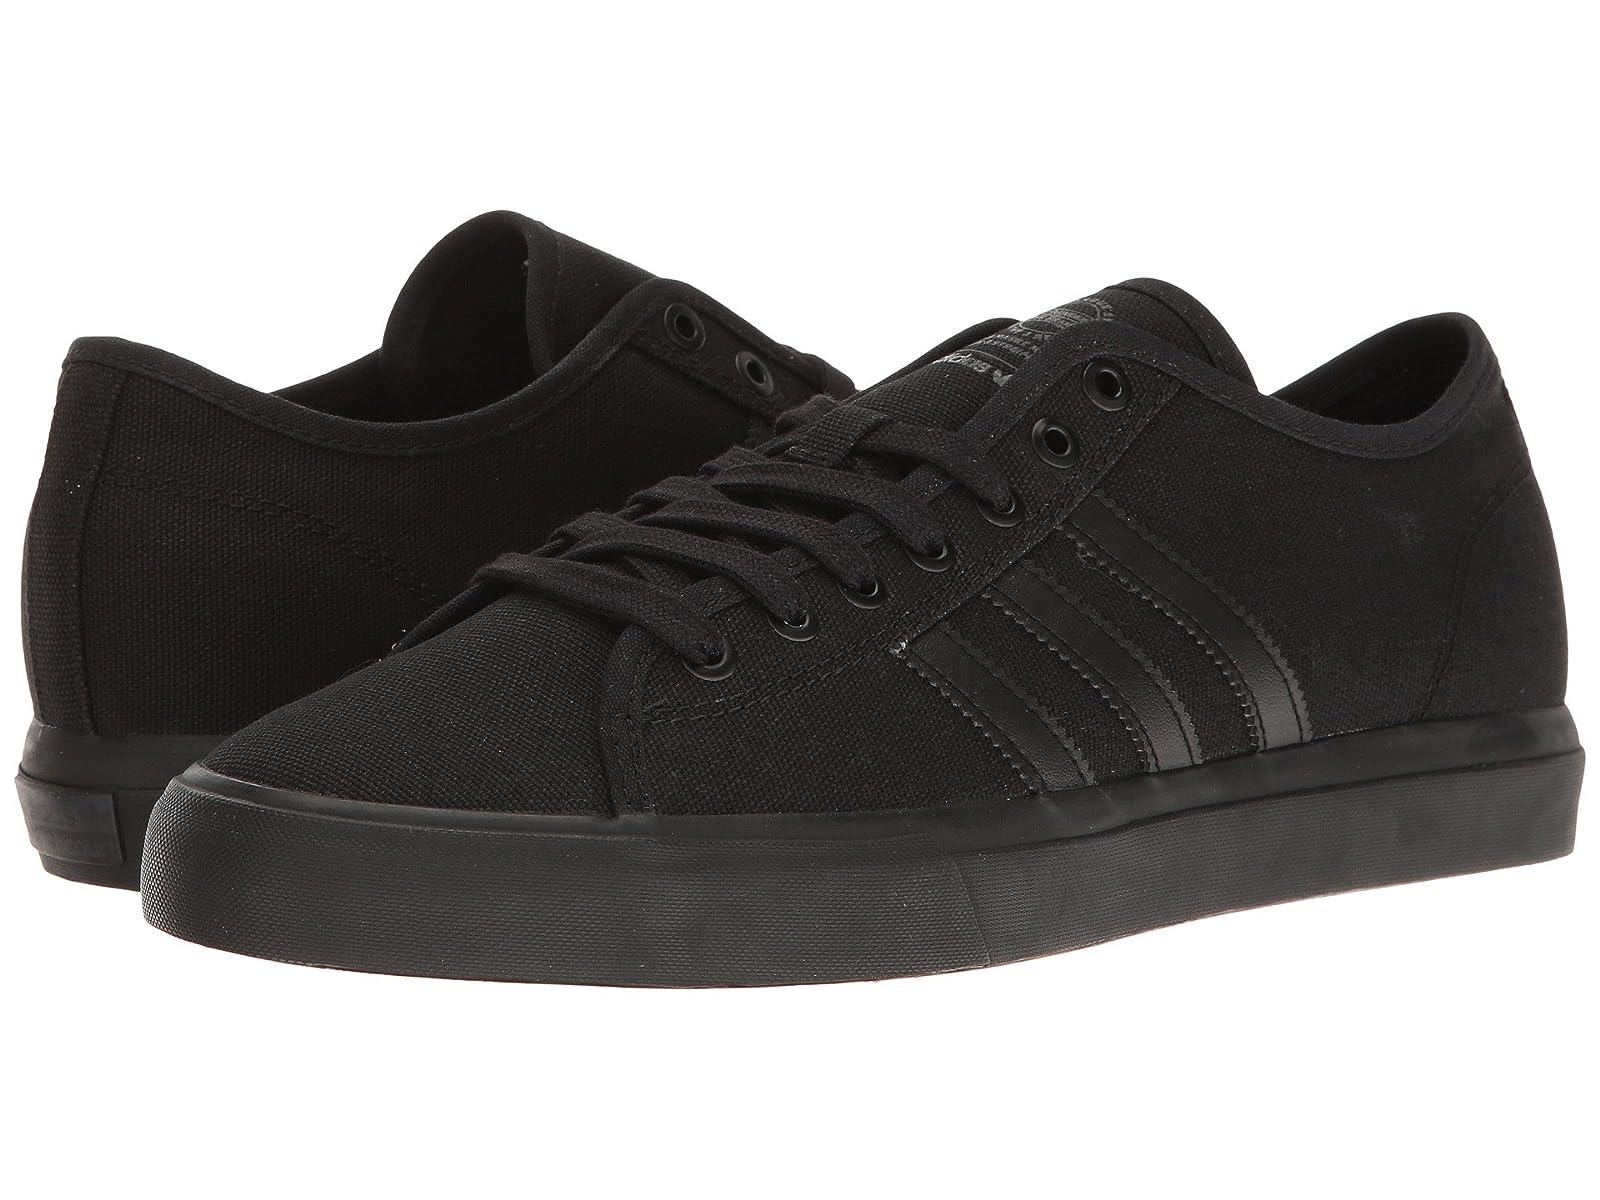 adidas Skateboarding Matchcourt RXAtmospheric grades have affordable shoes